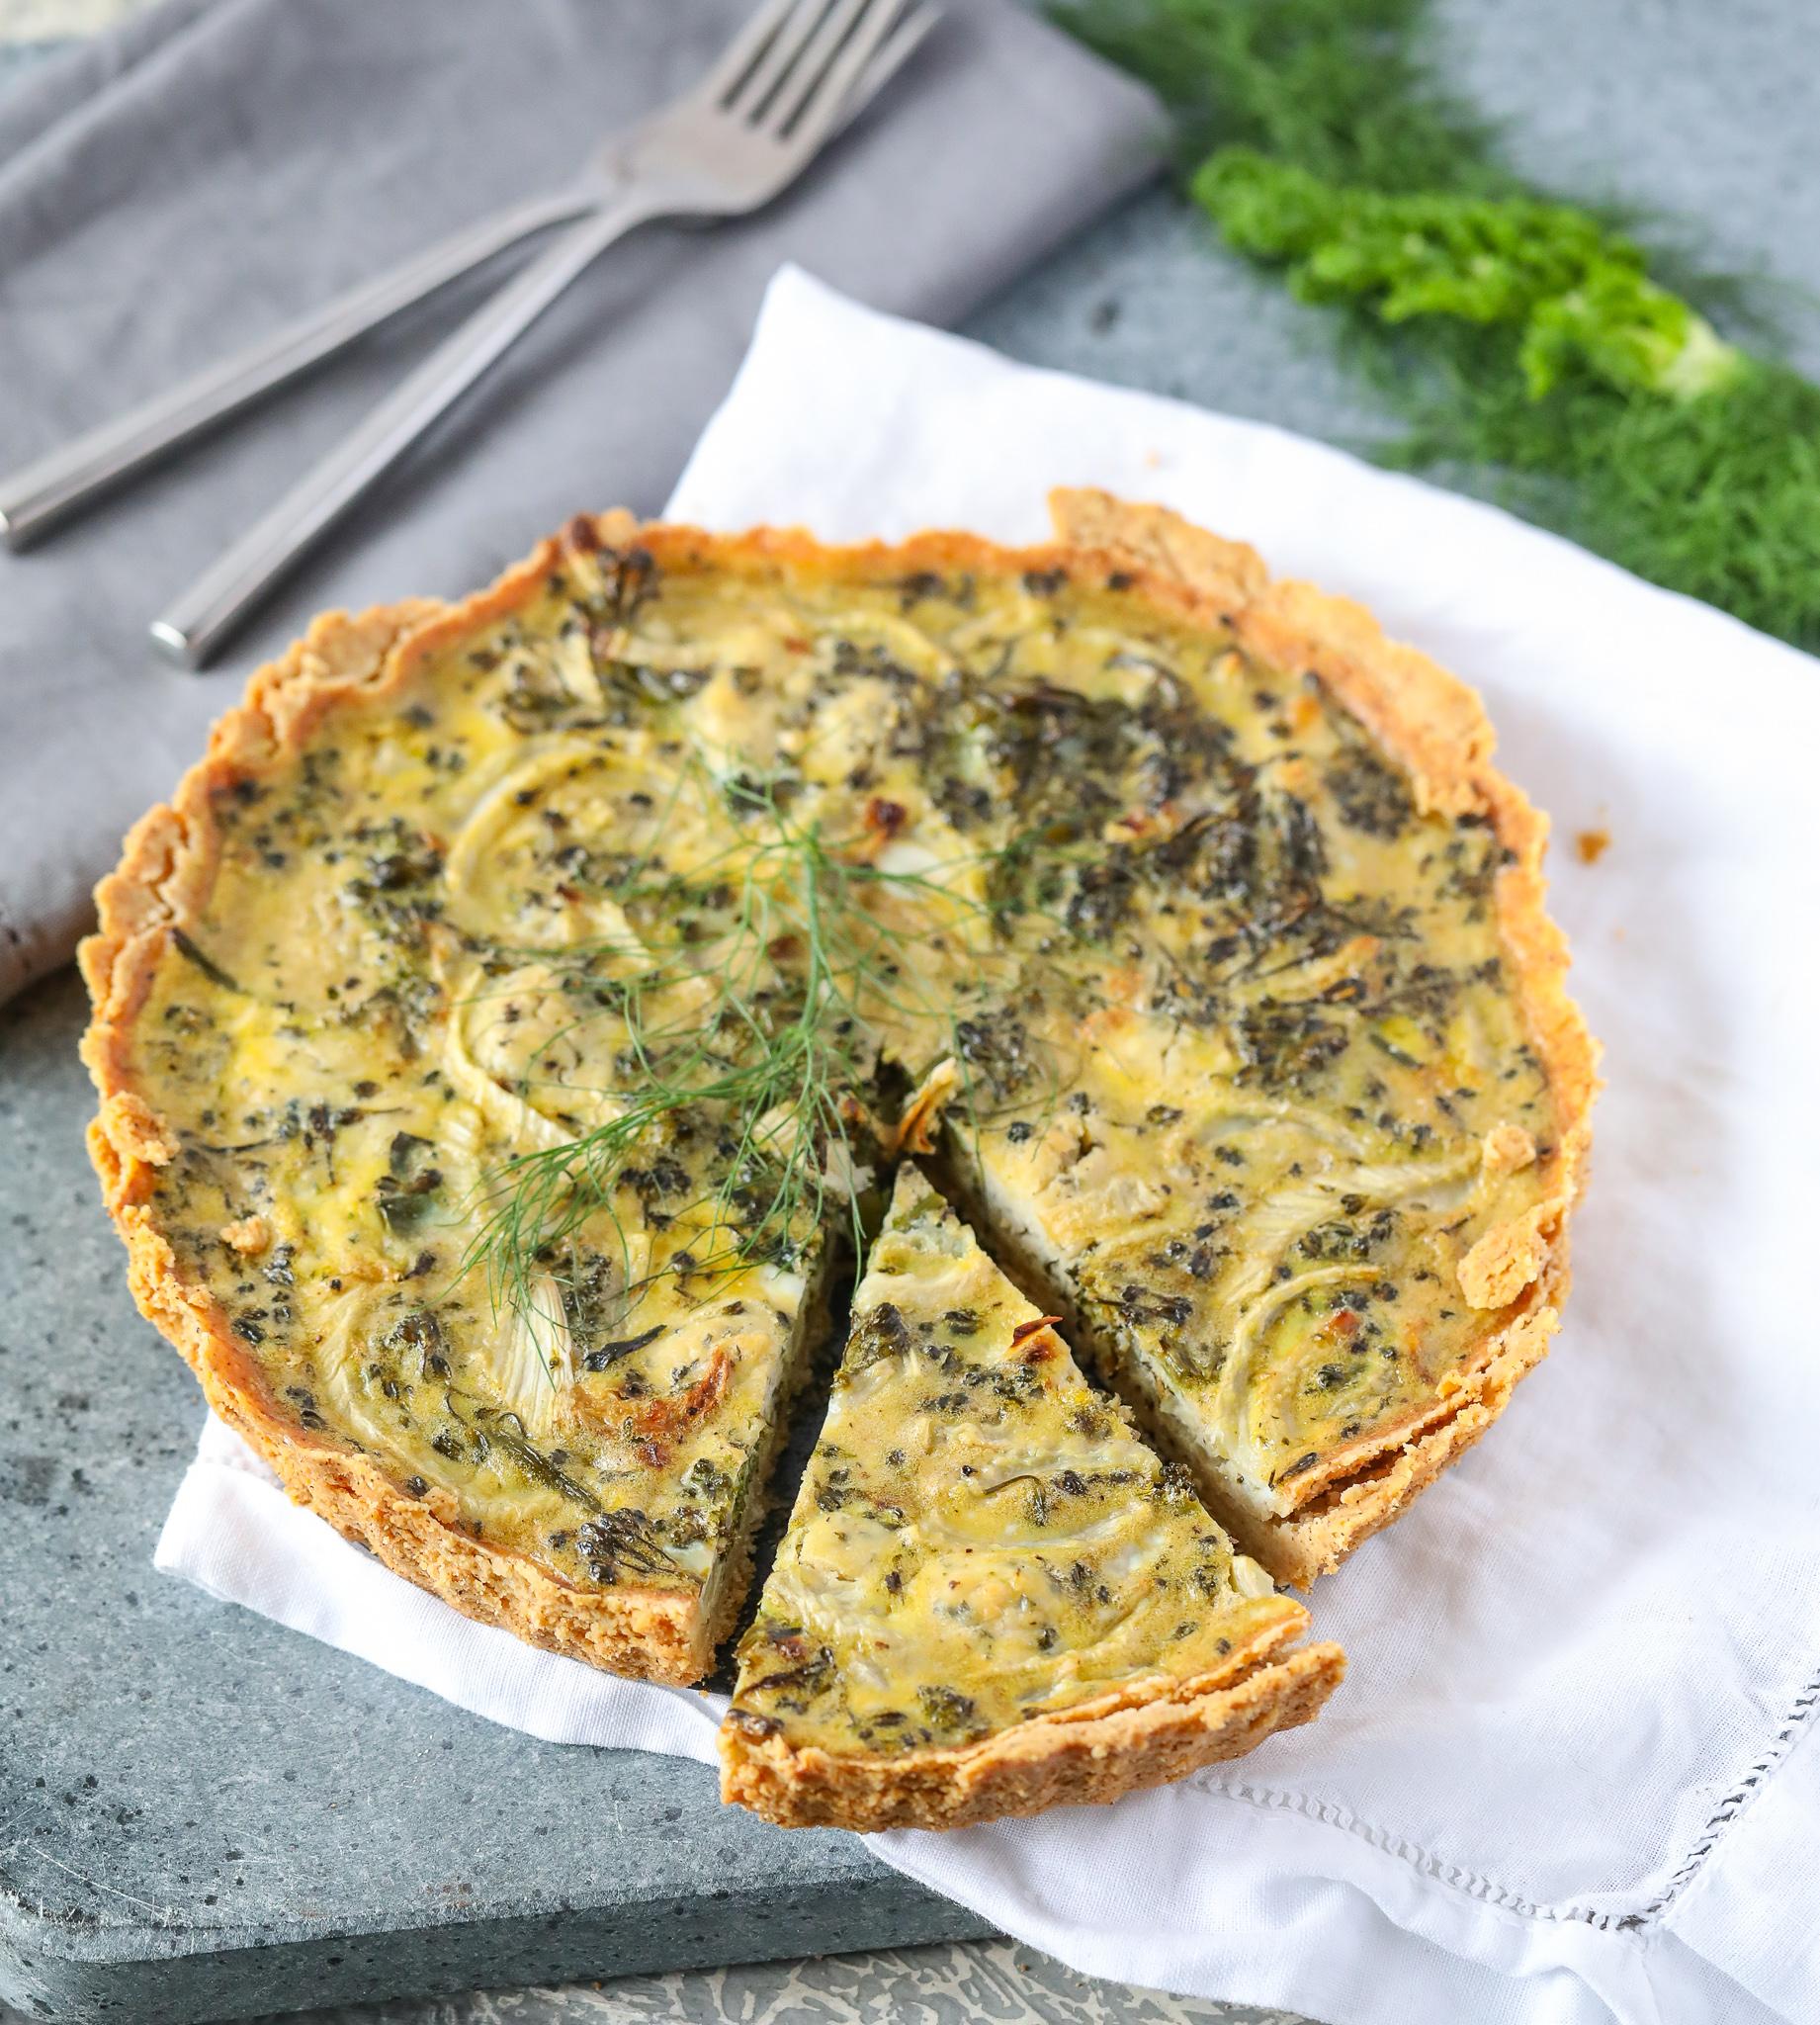 Roasted Fennel & Broccoli Egg Tart (Paleo, Grain-free)